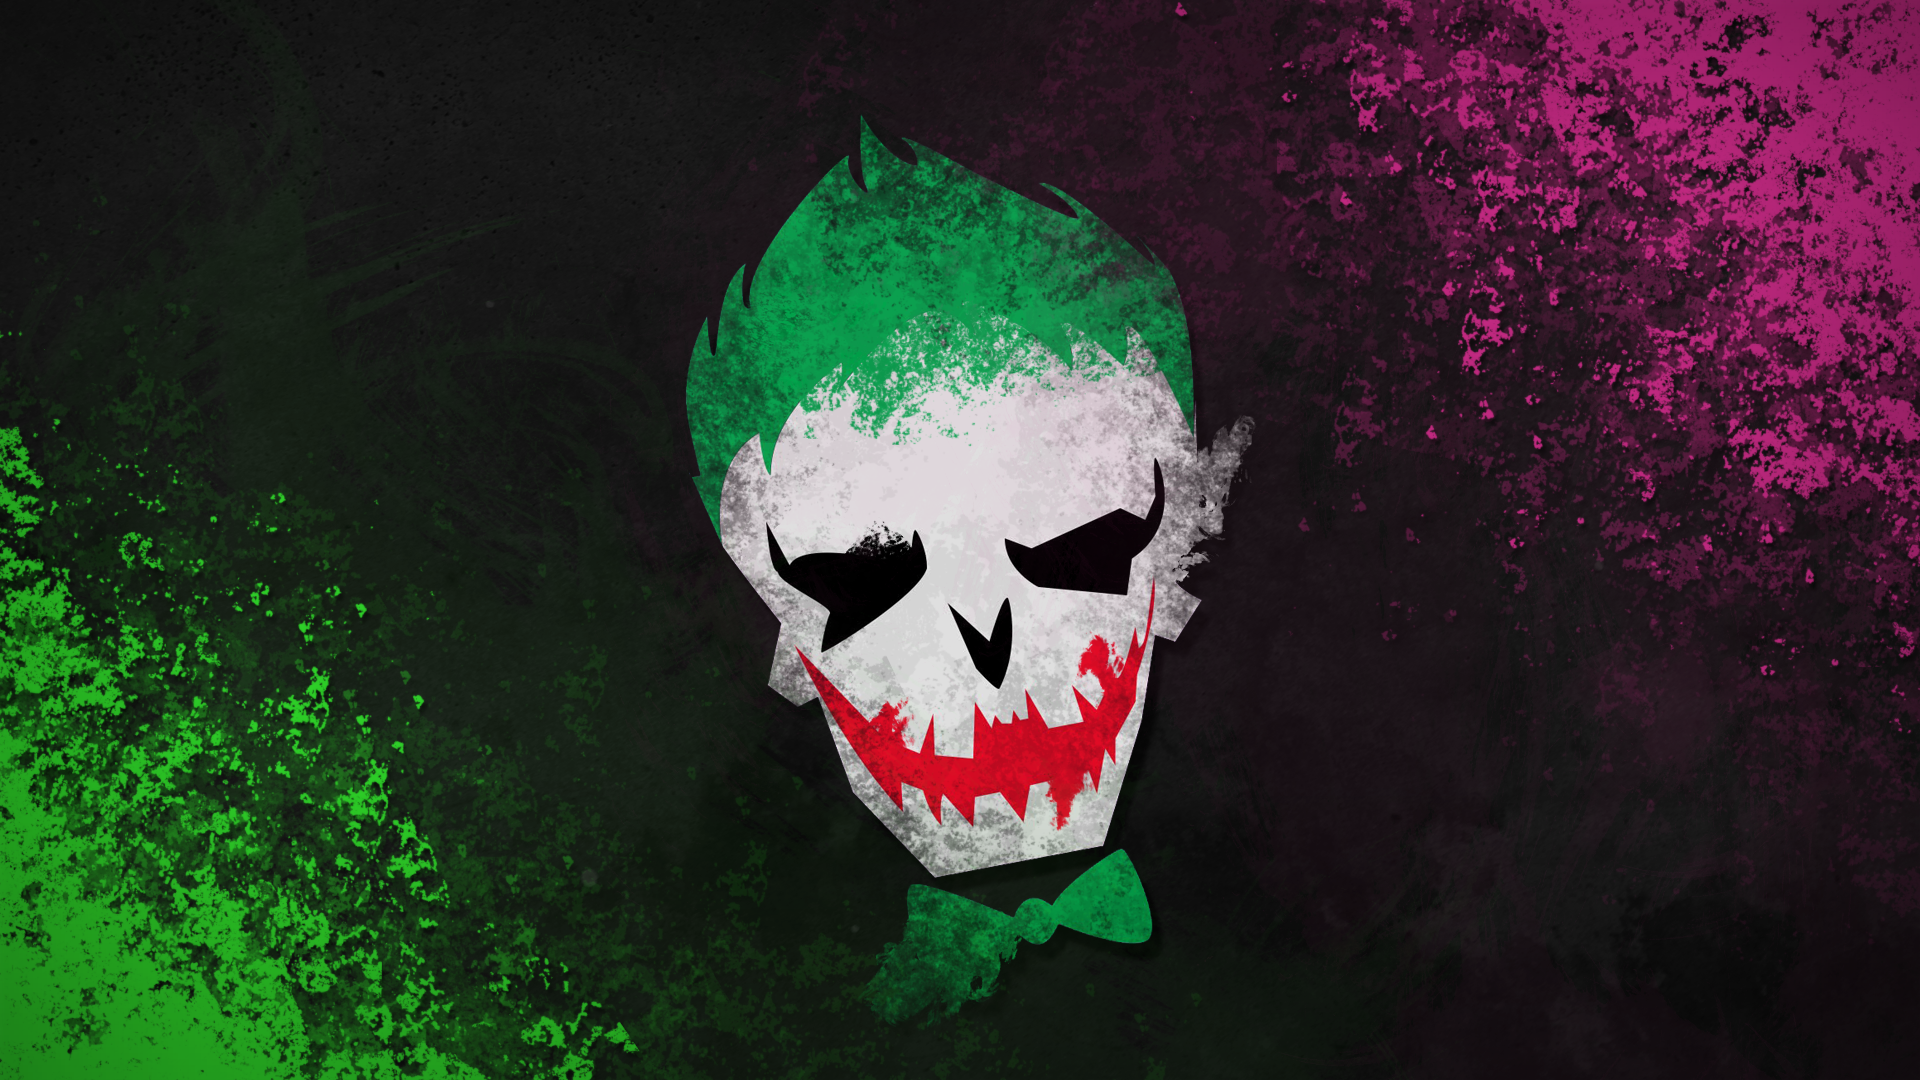 Suicide squad joker wallpaper by klarkao on deviantart for Joker wallpaper 4k